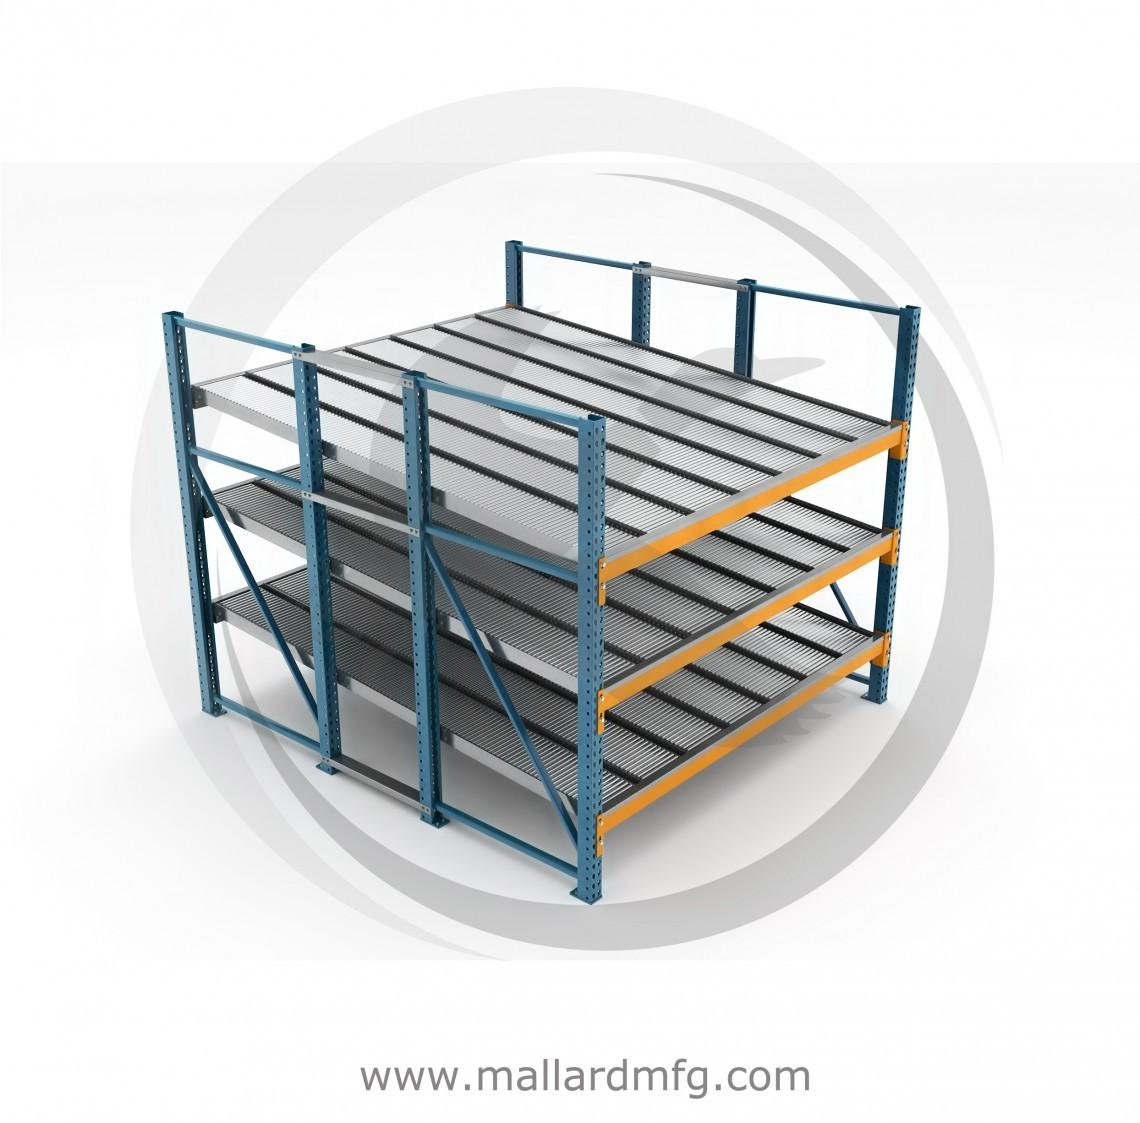 Dyna-Flo Carton Flow Mallard Manufacturing